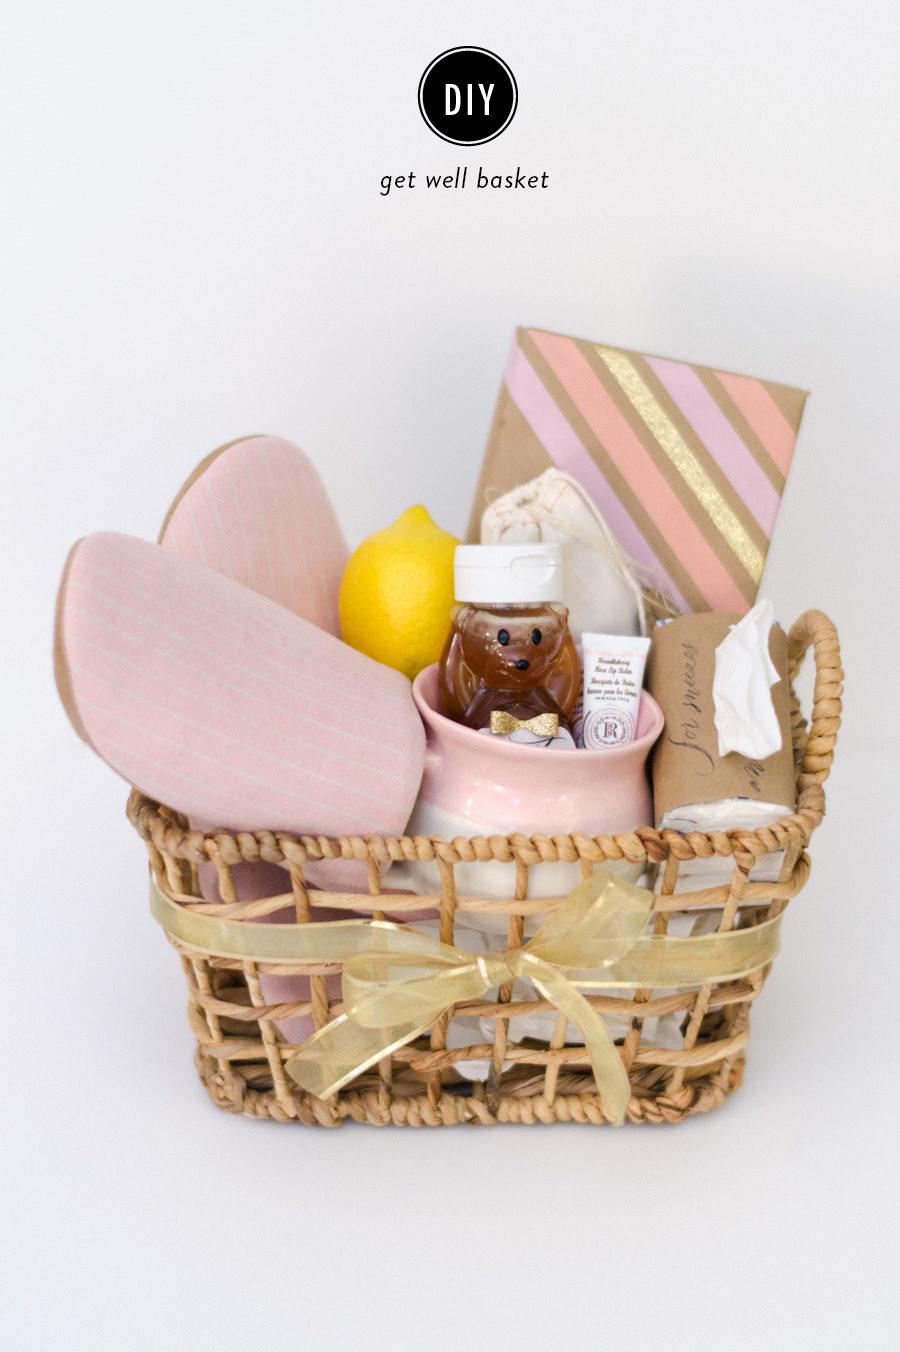 DIY Get Well Gift Basket